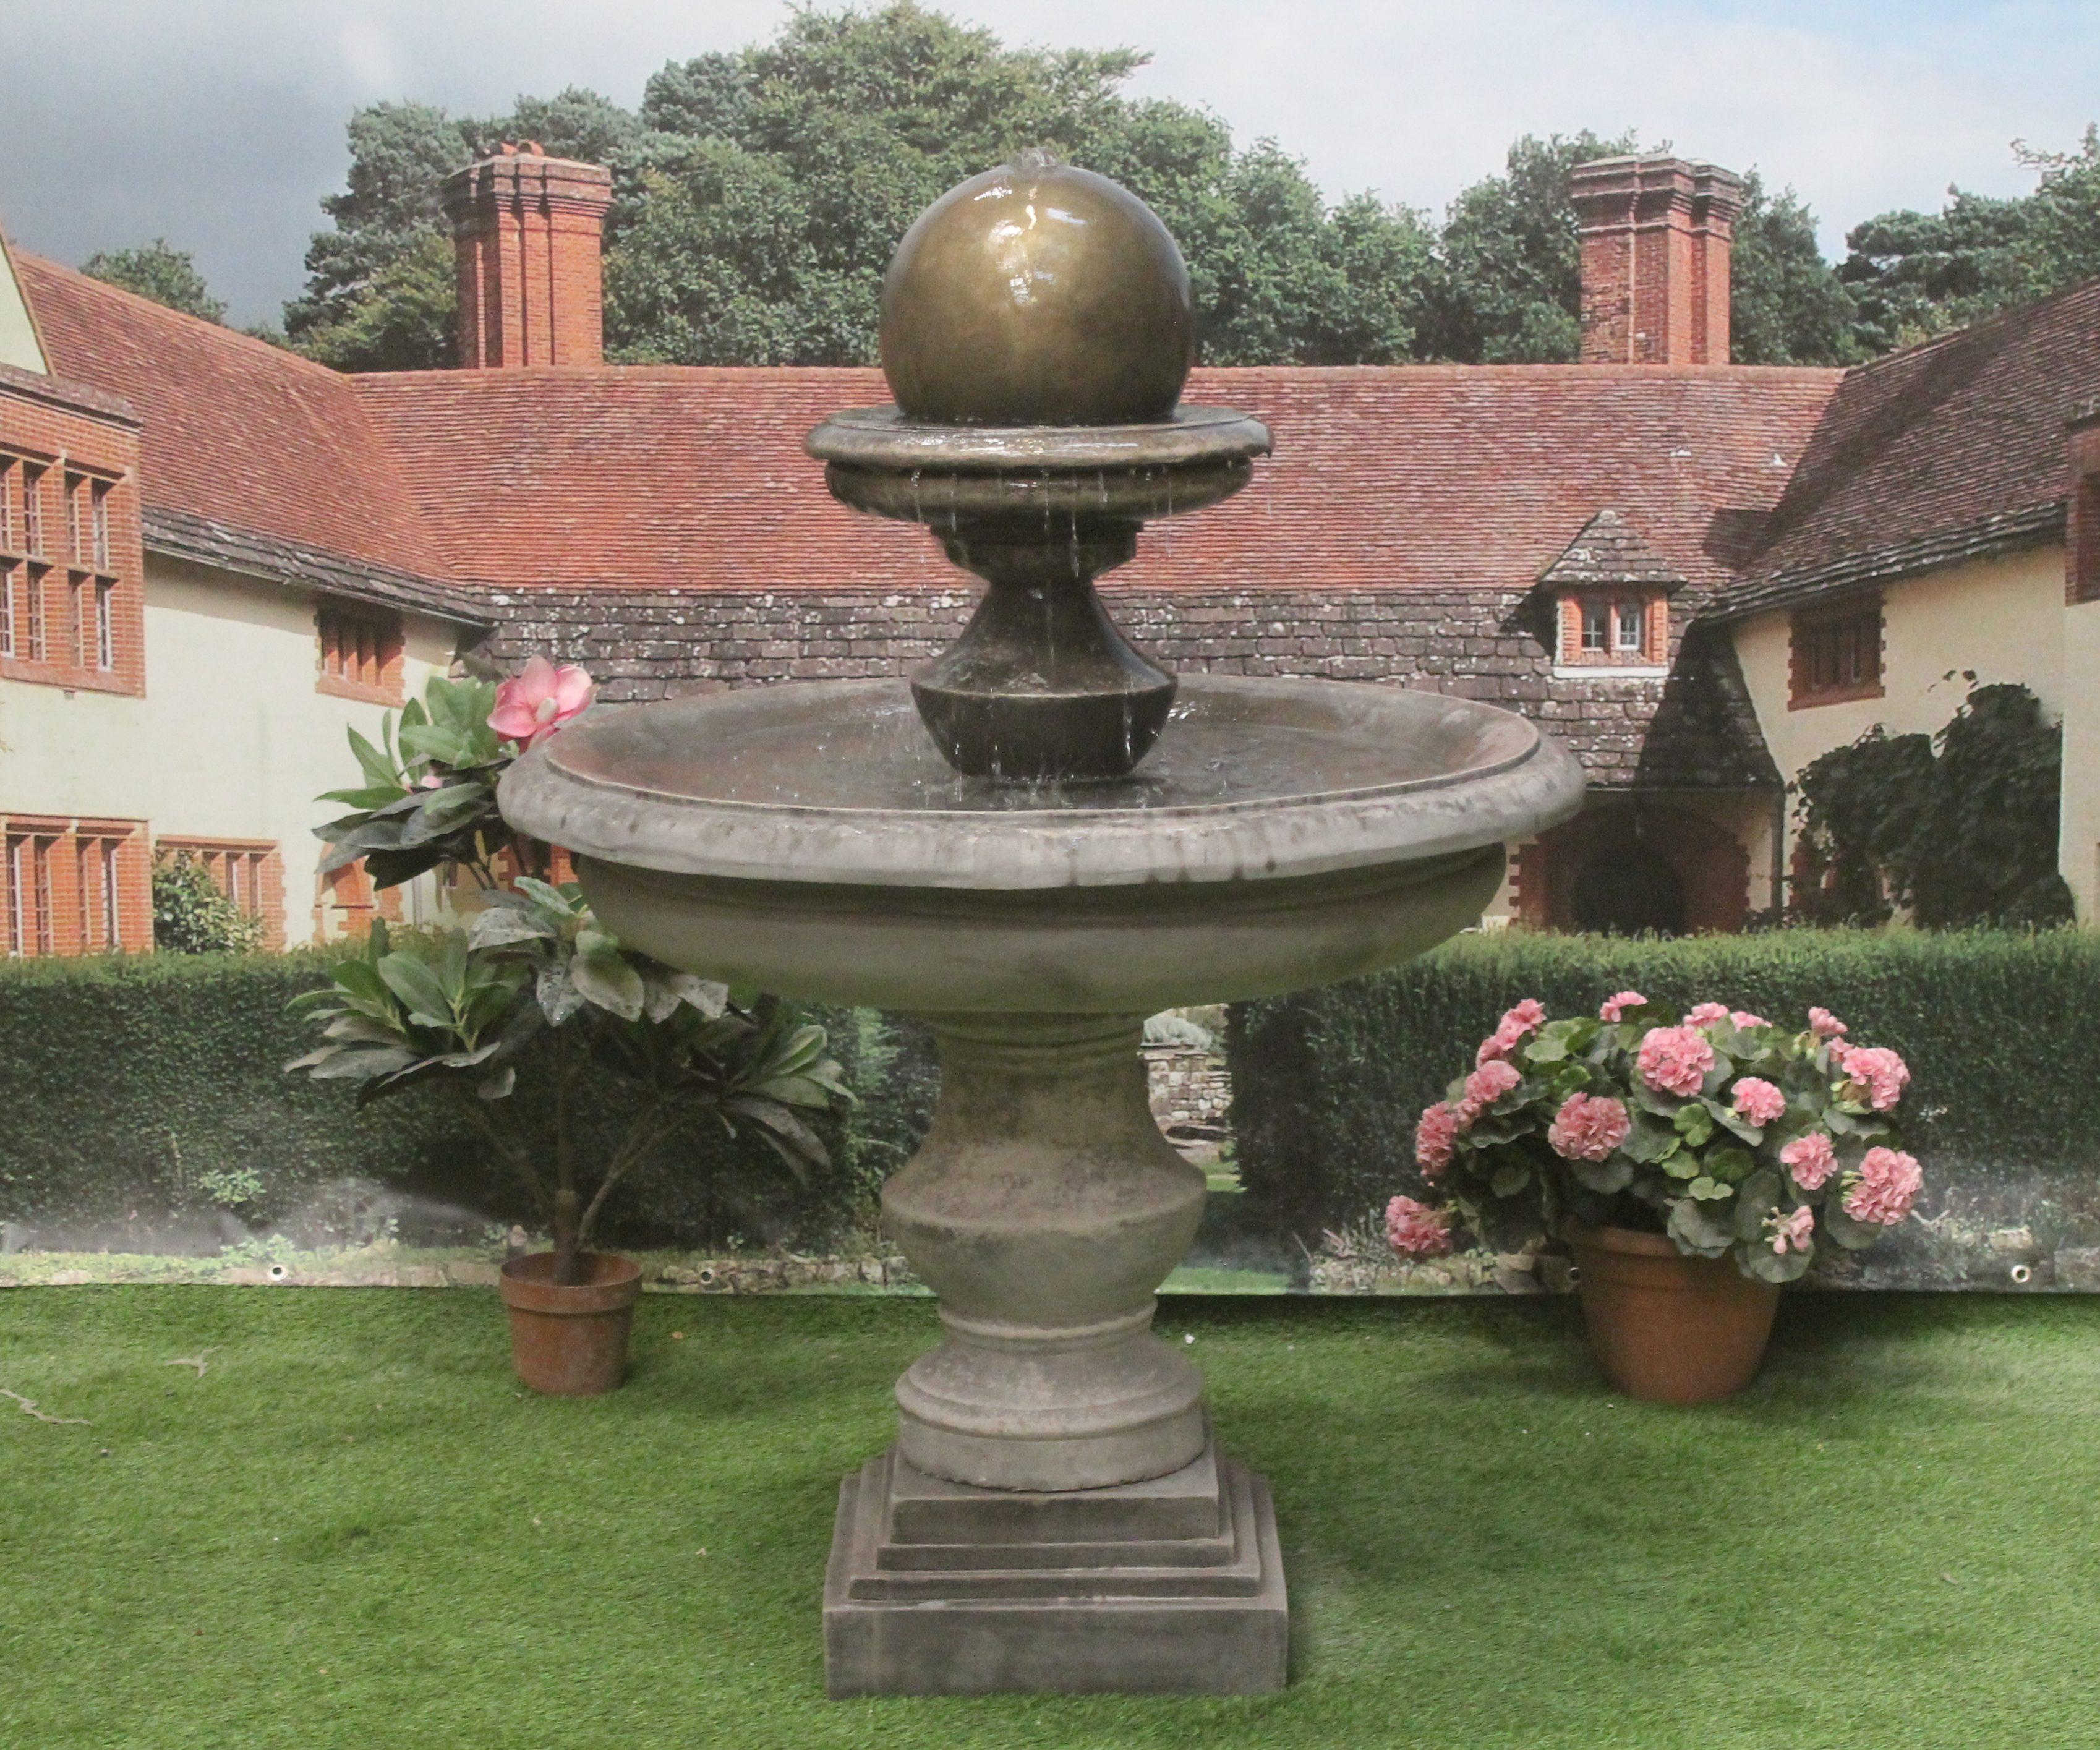 Large Regis Ball Fountain Stone Garden Ornaments